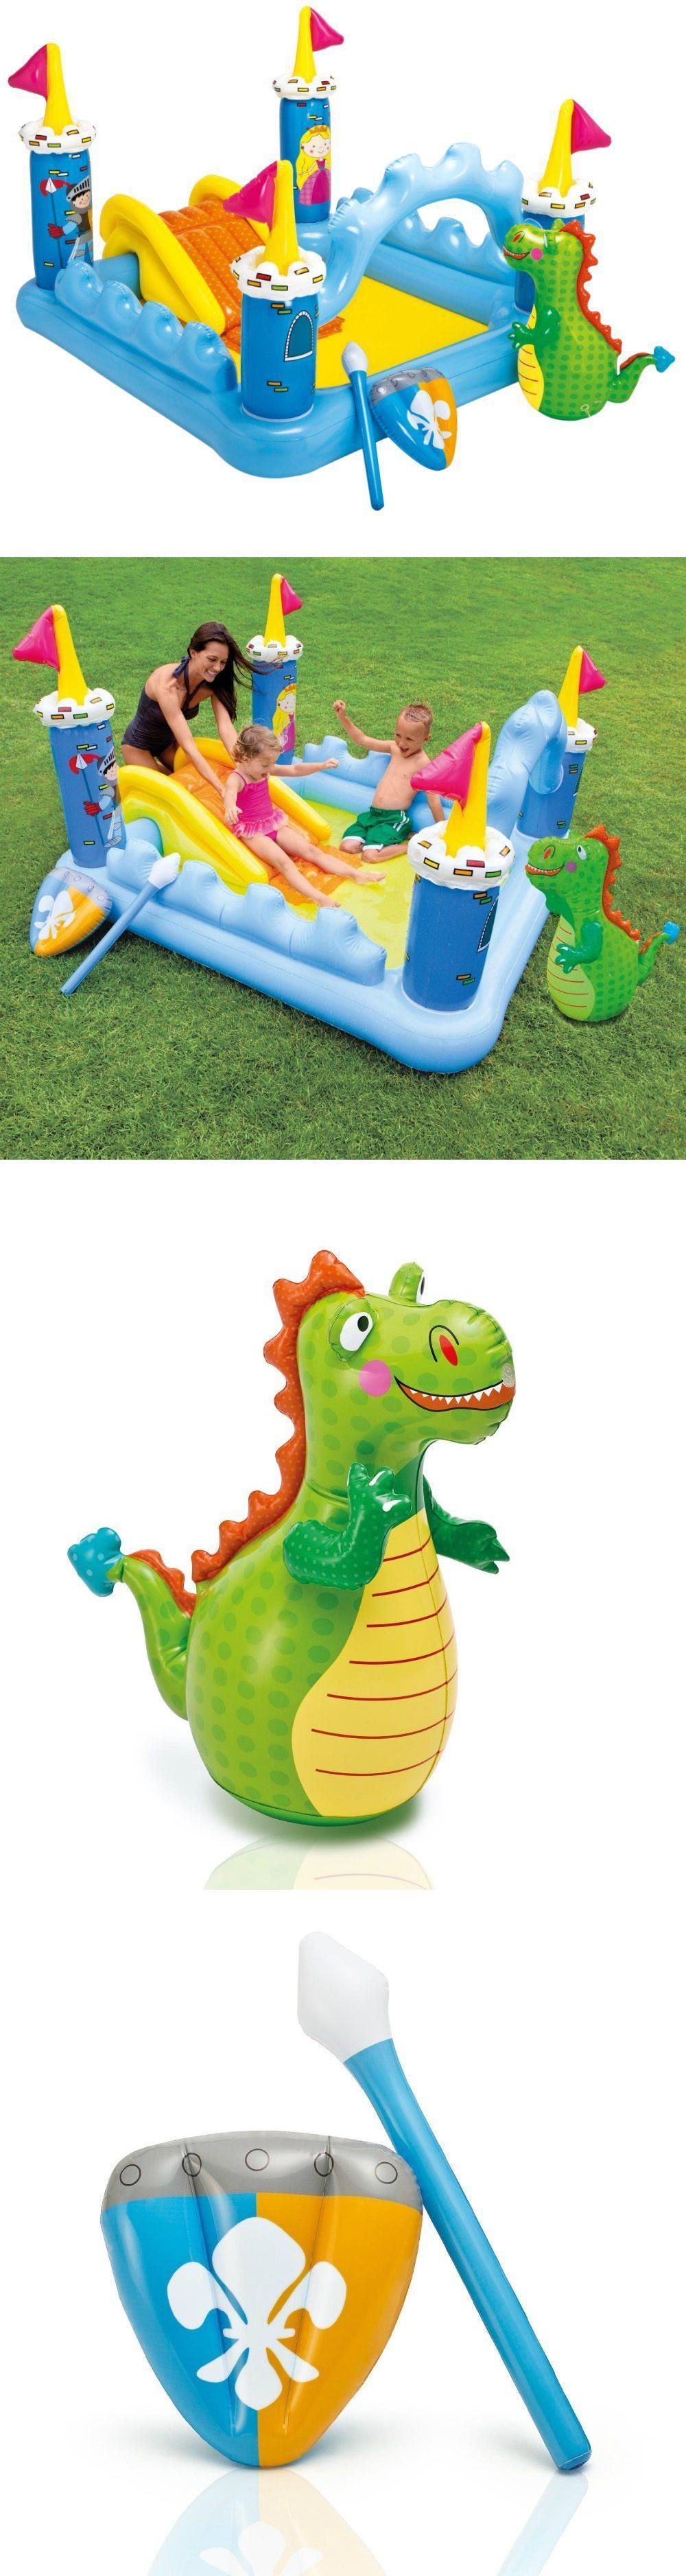 inflatable and kid pools 116407 play center kiddie pool intex